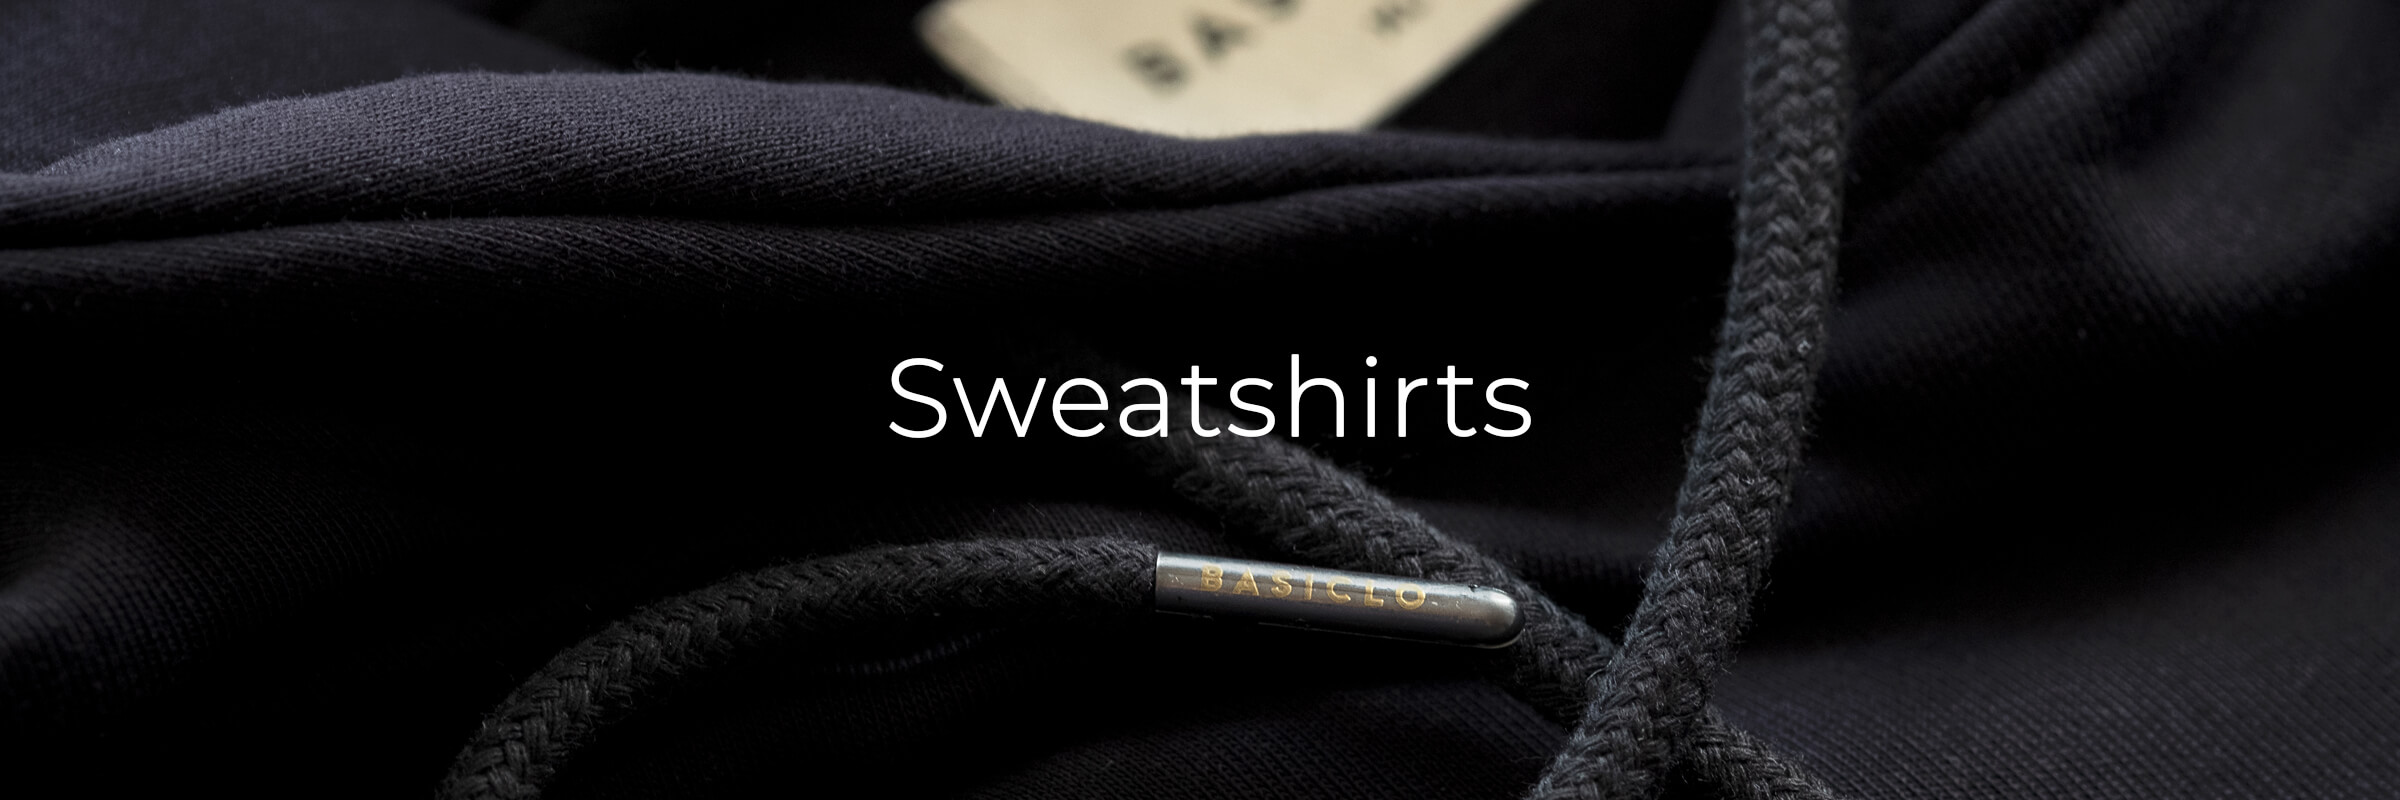 Sweatshirts men's collection banner